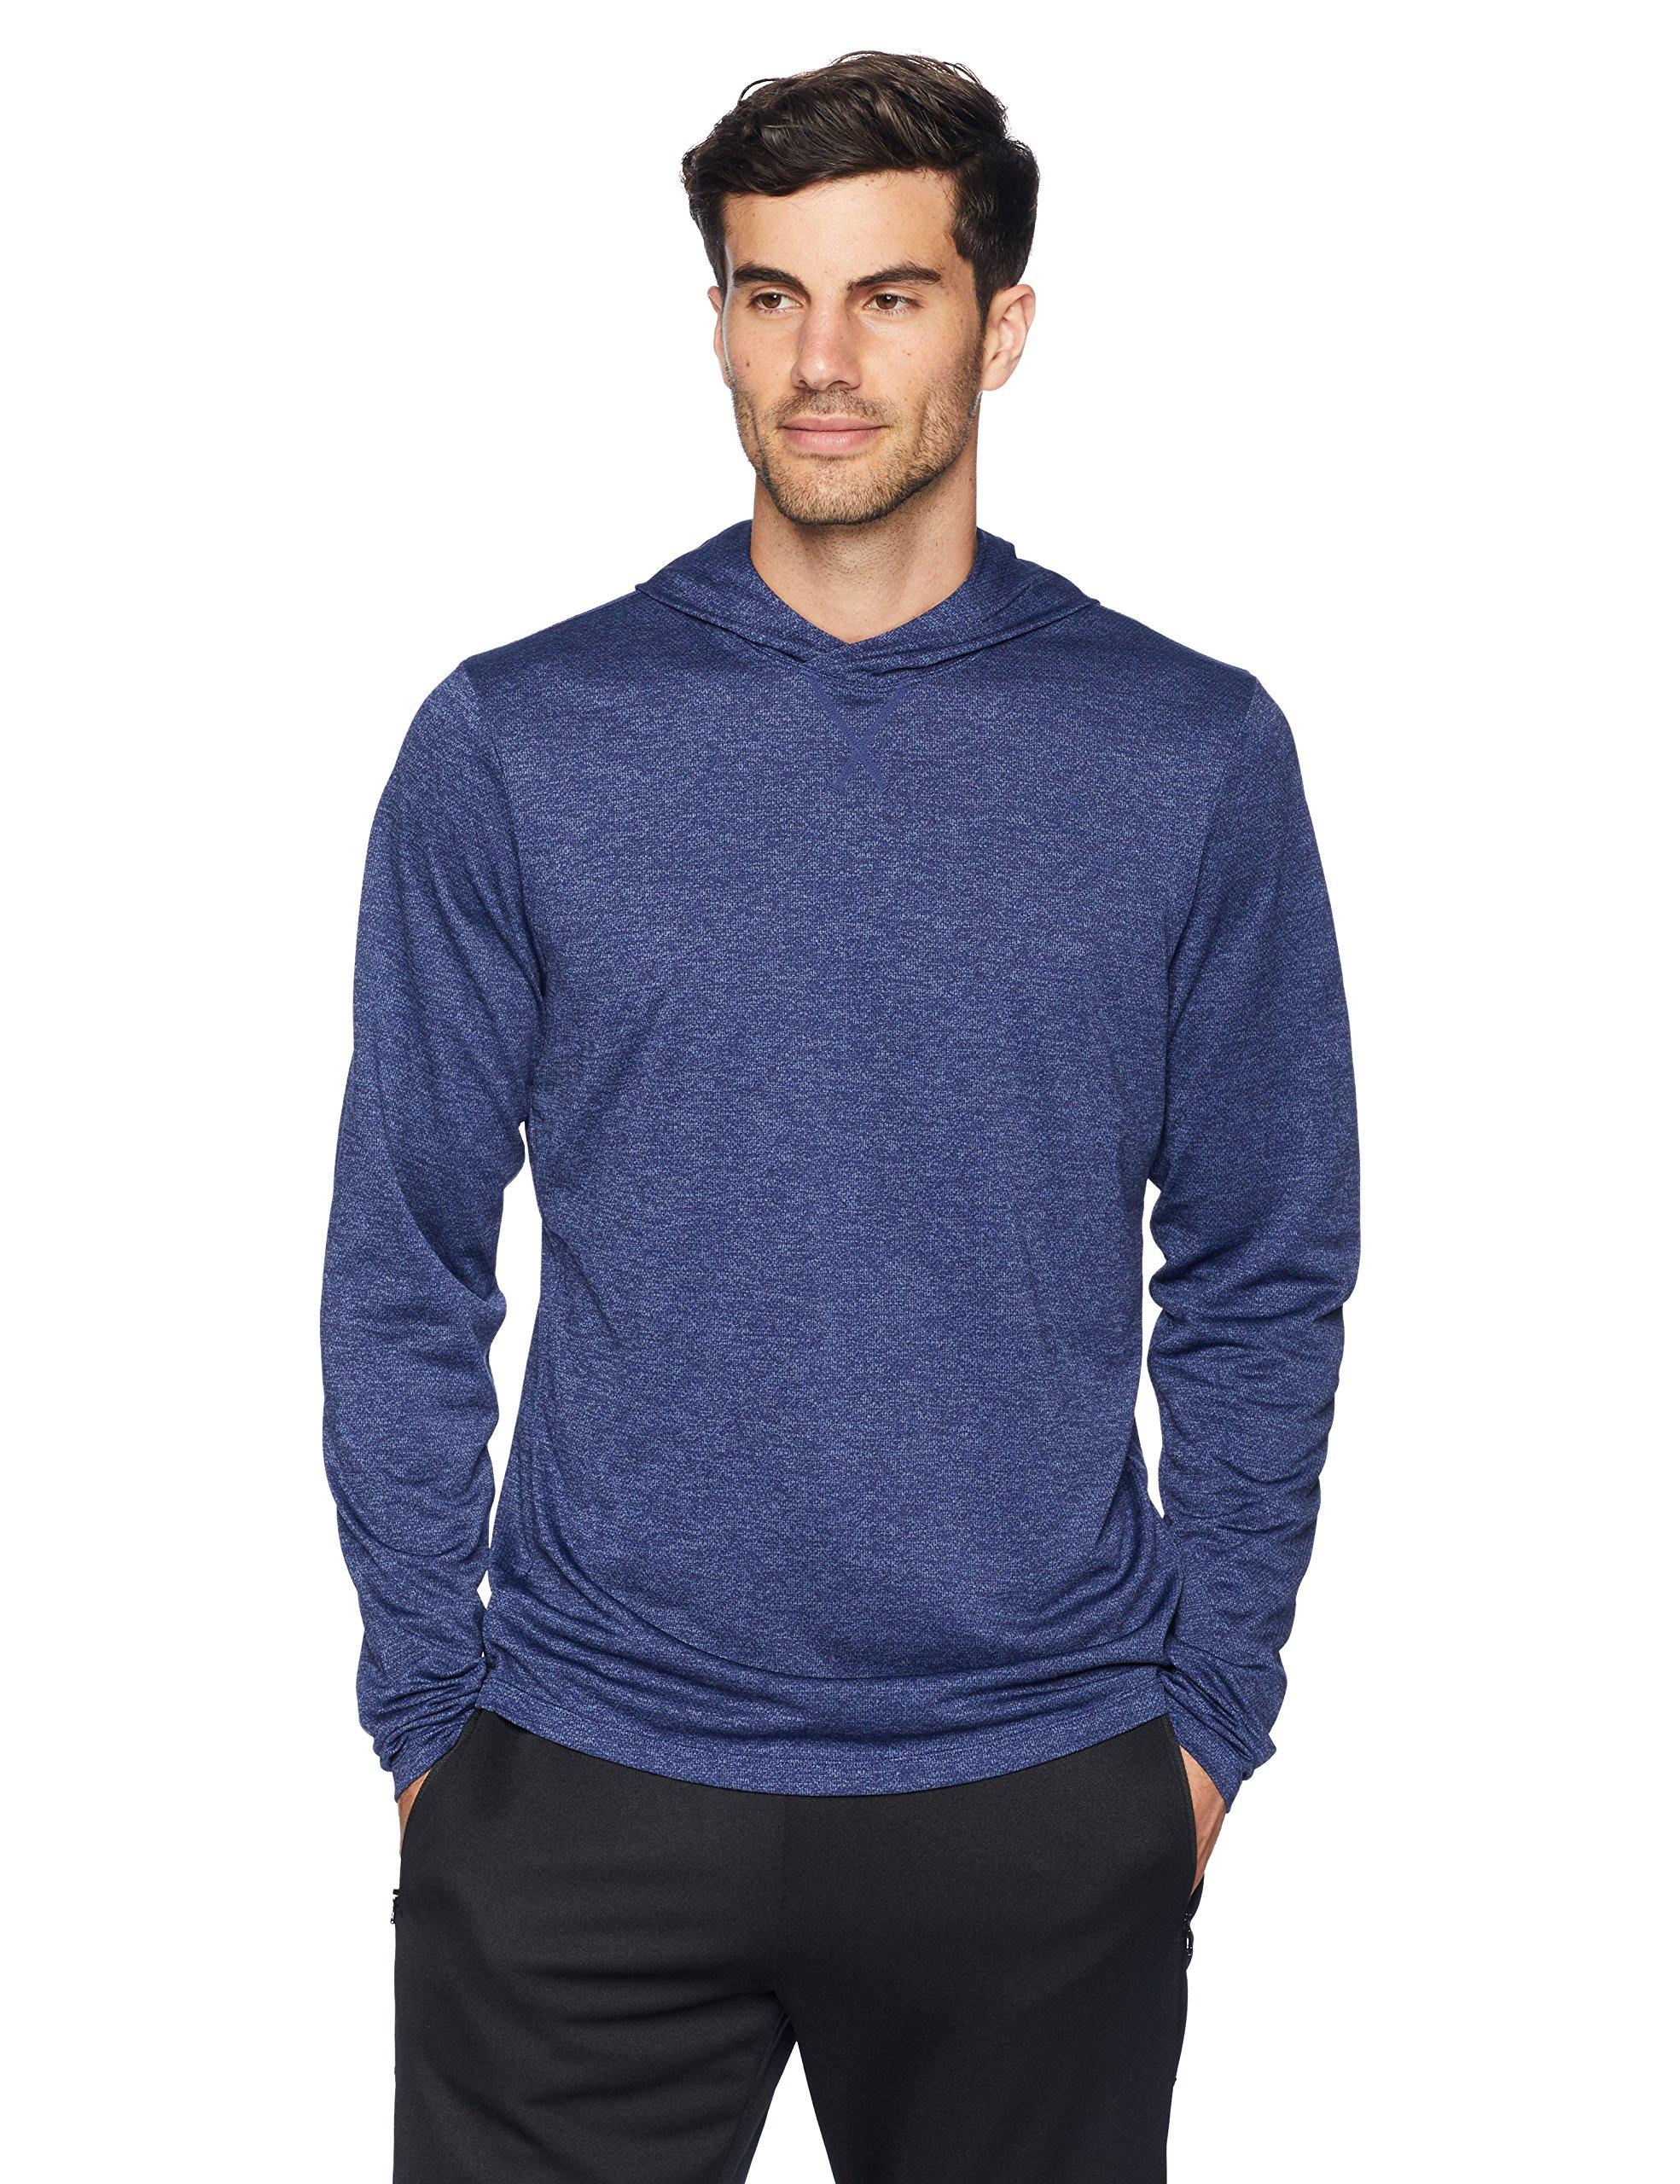 Amazon Brand - Peak Velocity Men's VXE Long Sleeve Quick-dry Loose-Fit Hoodie